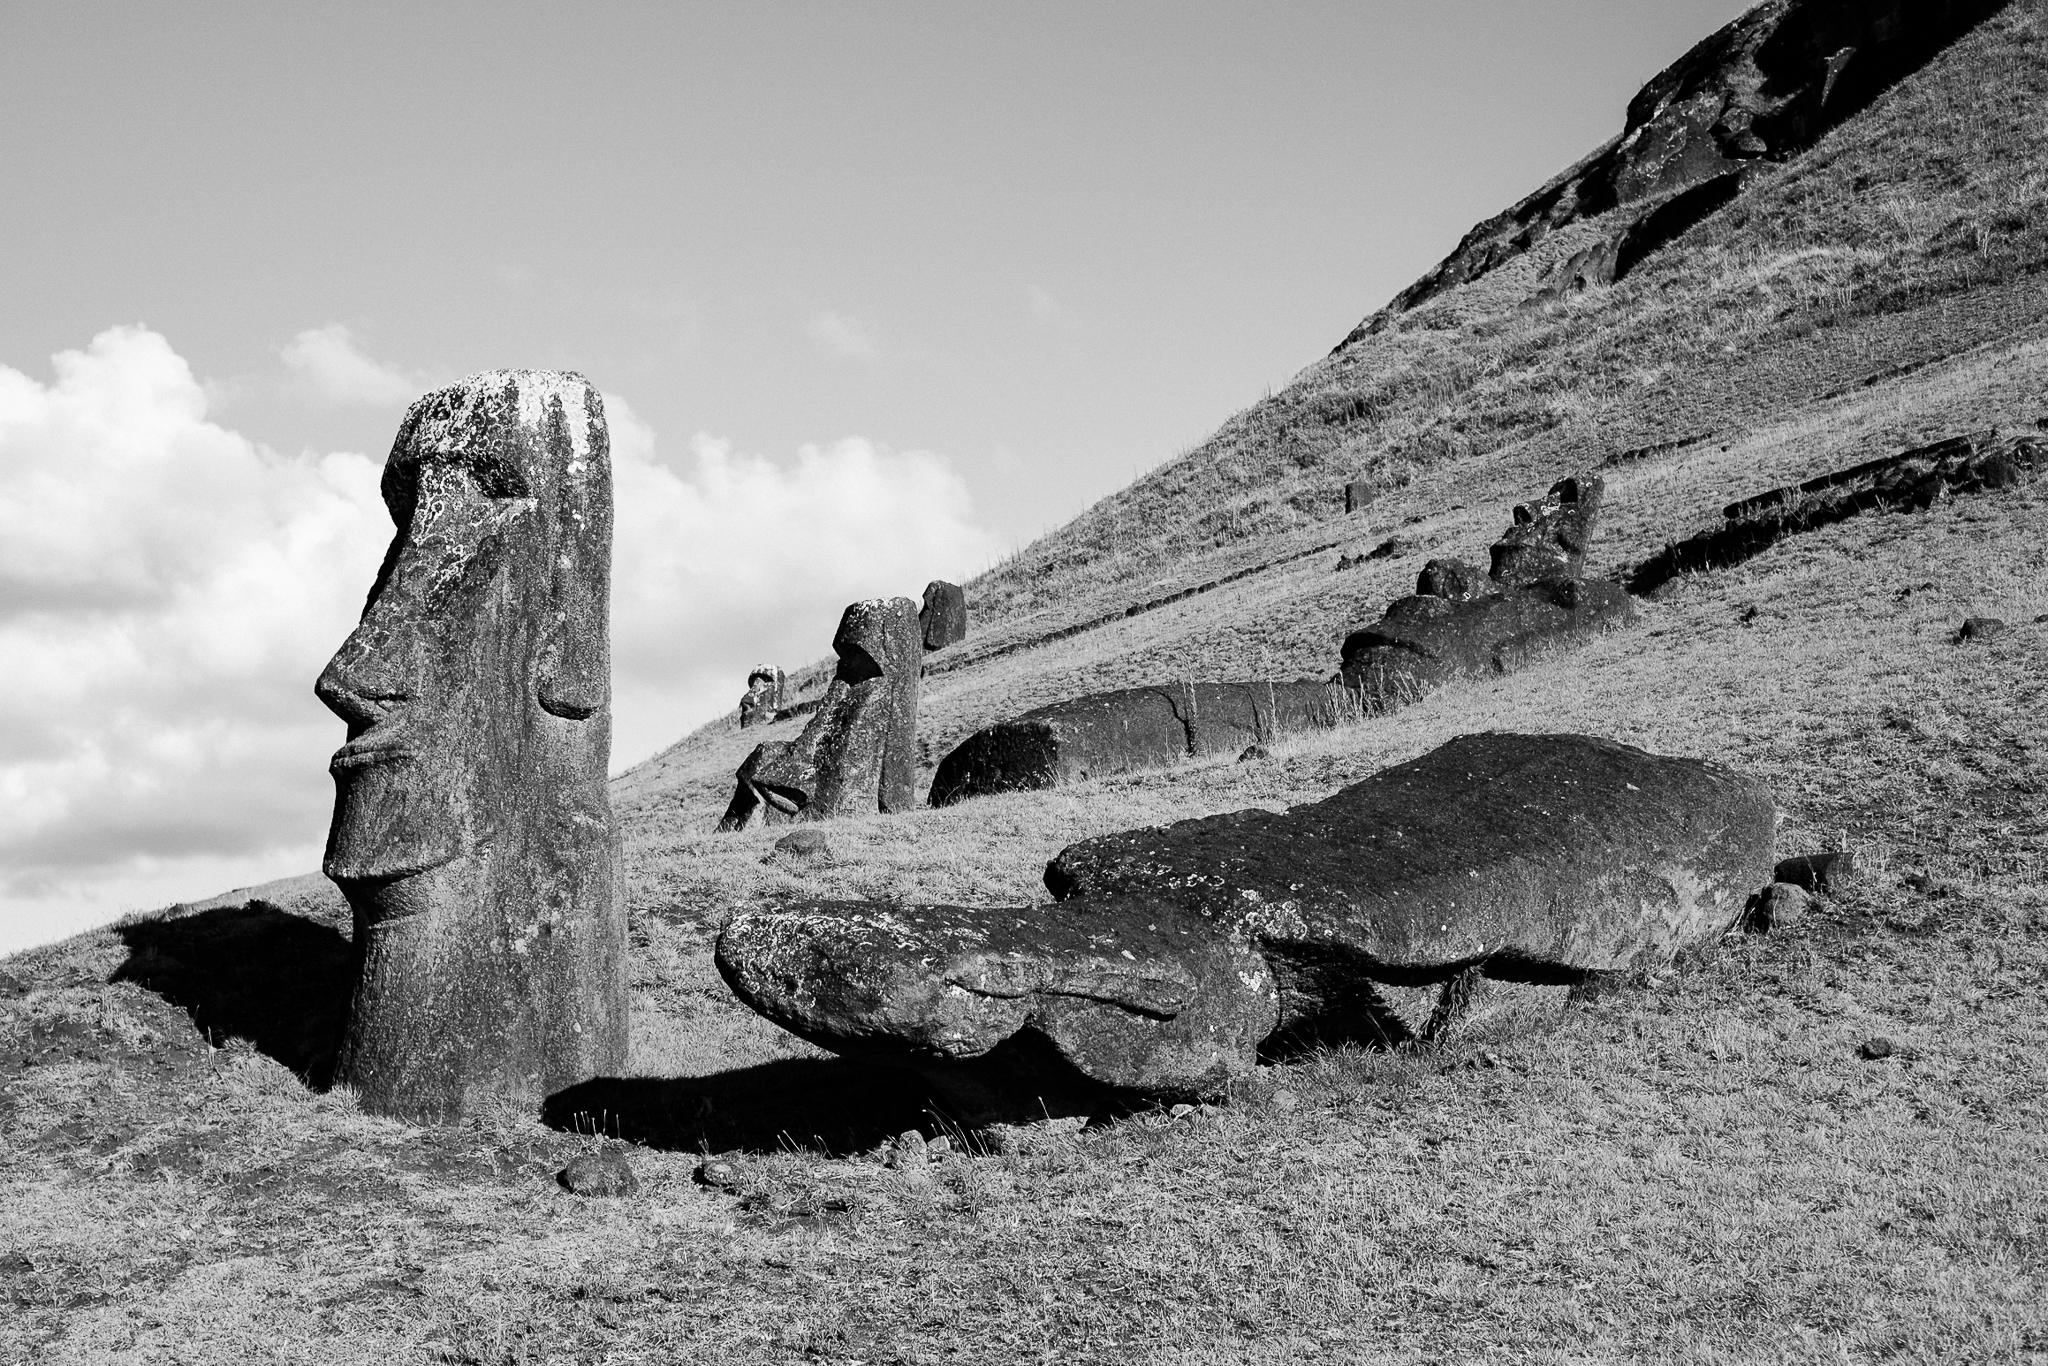 Katie_Mitchell_Photography_India_Mongolia_Worldwide_Travel_Photographer_02.jpg